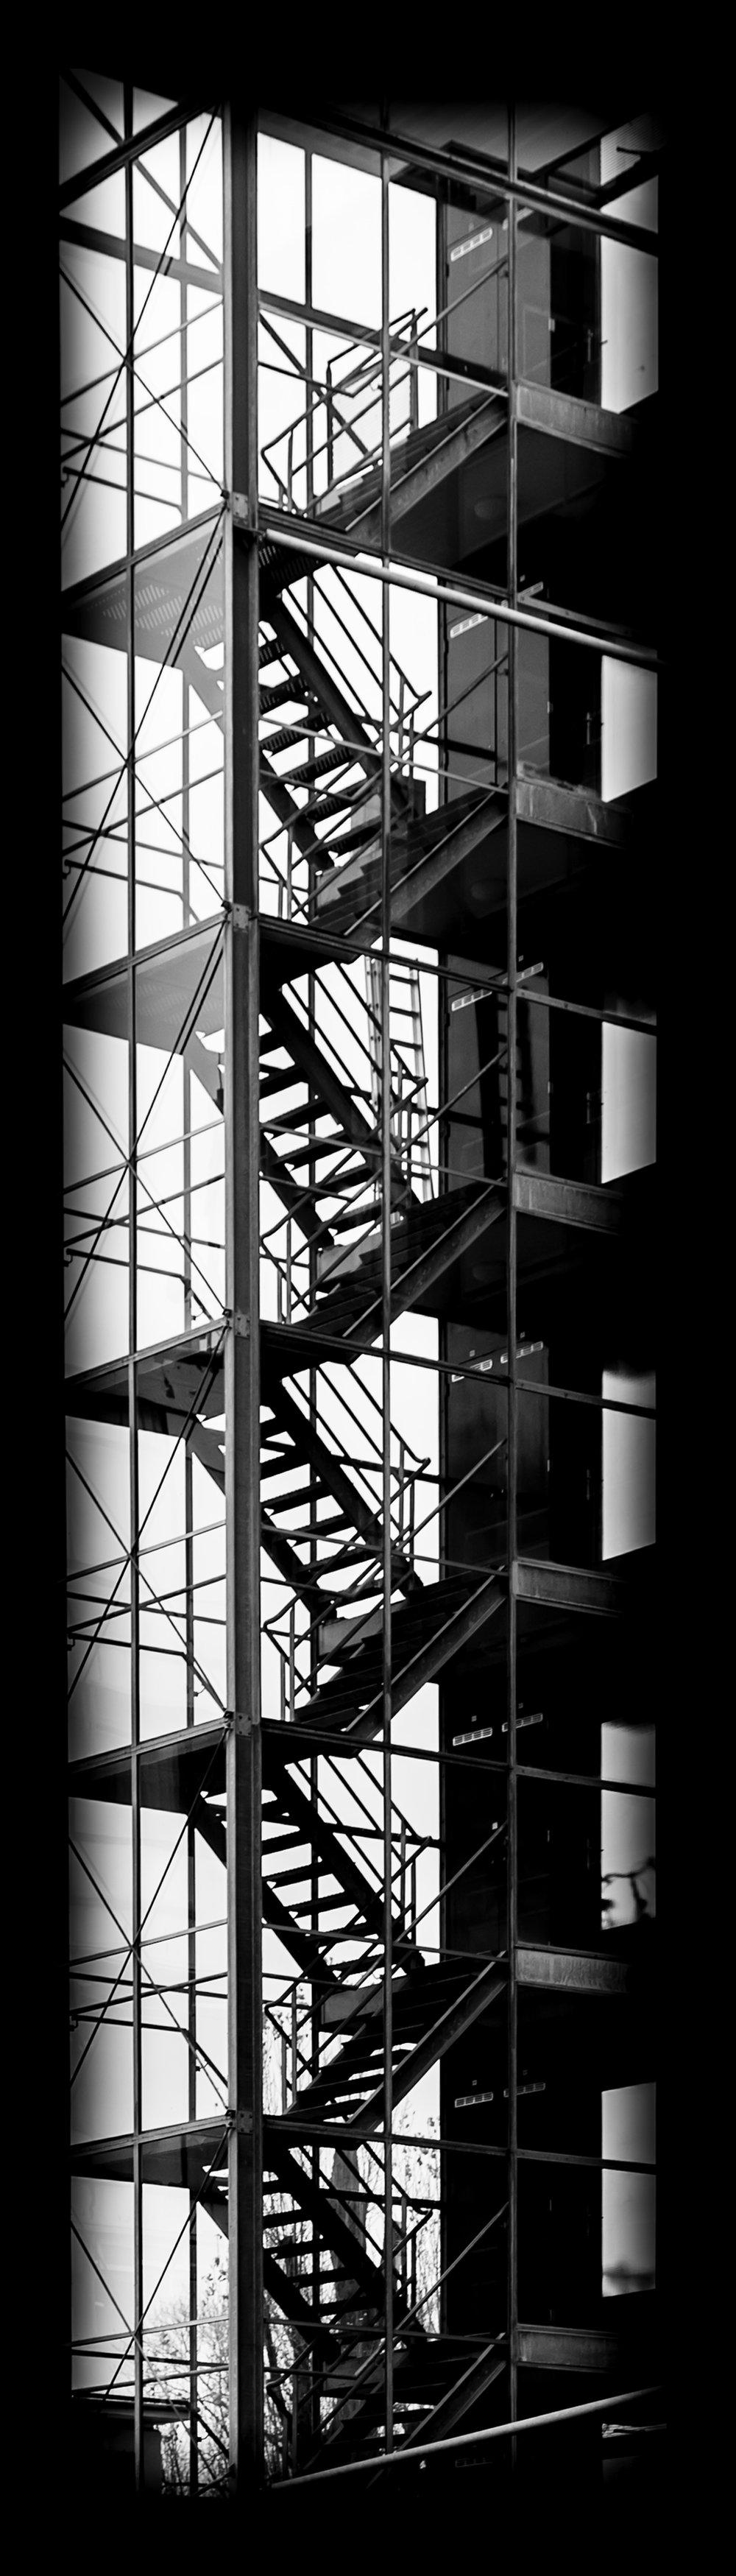 Bart Vos_Stairs1.jpg